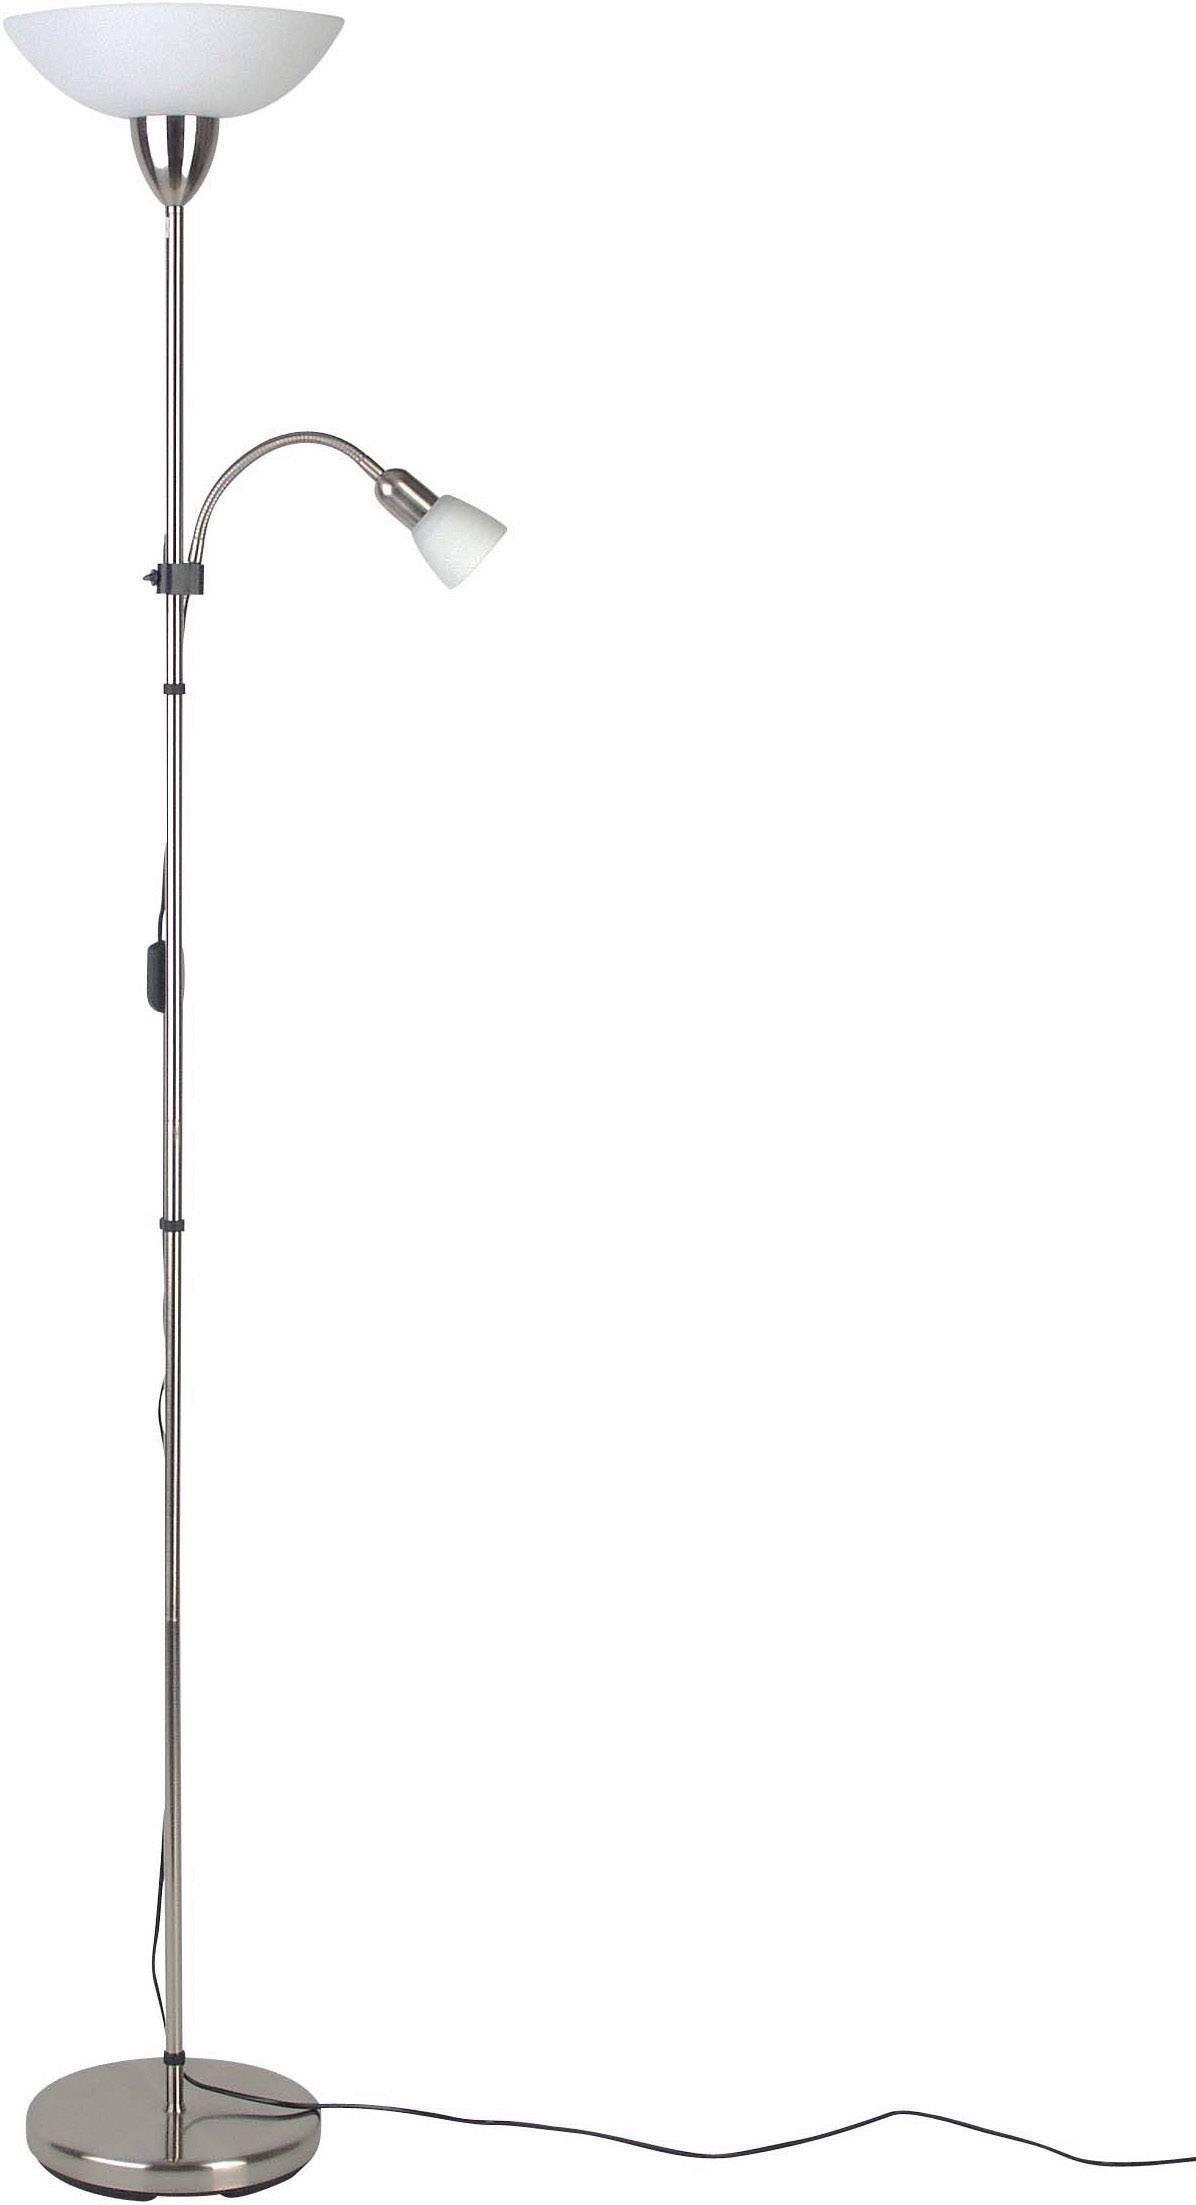 Lampa Brilliant Darlington, halogenová žárovka E27 60 W, železo